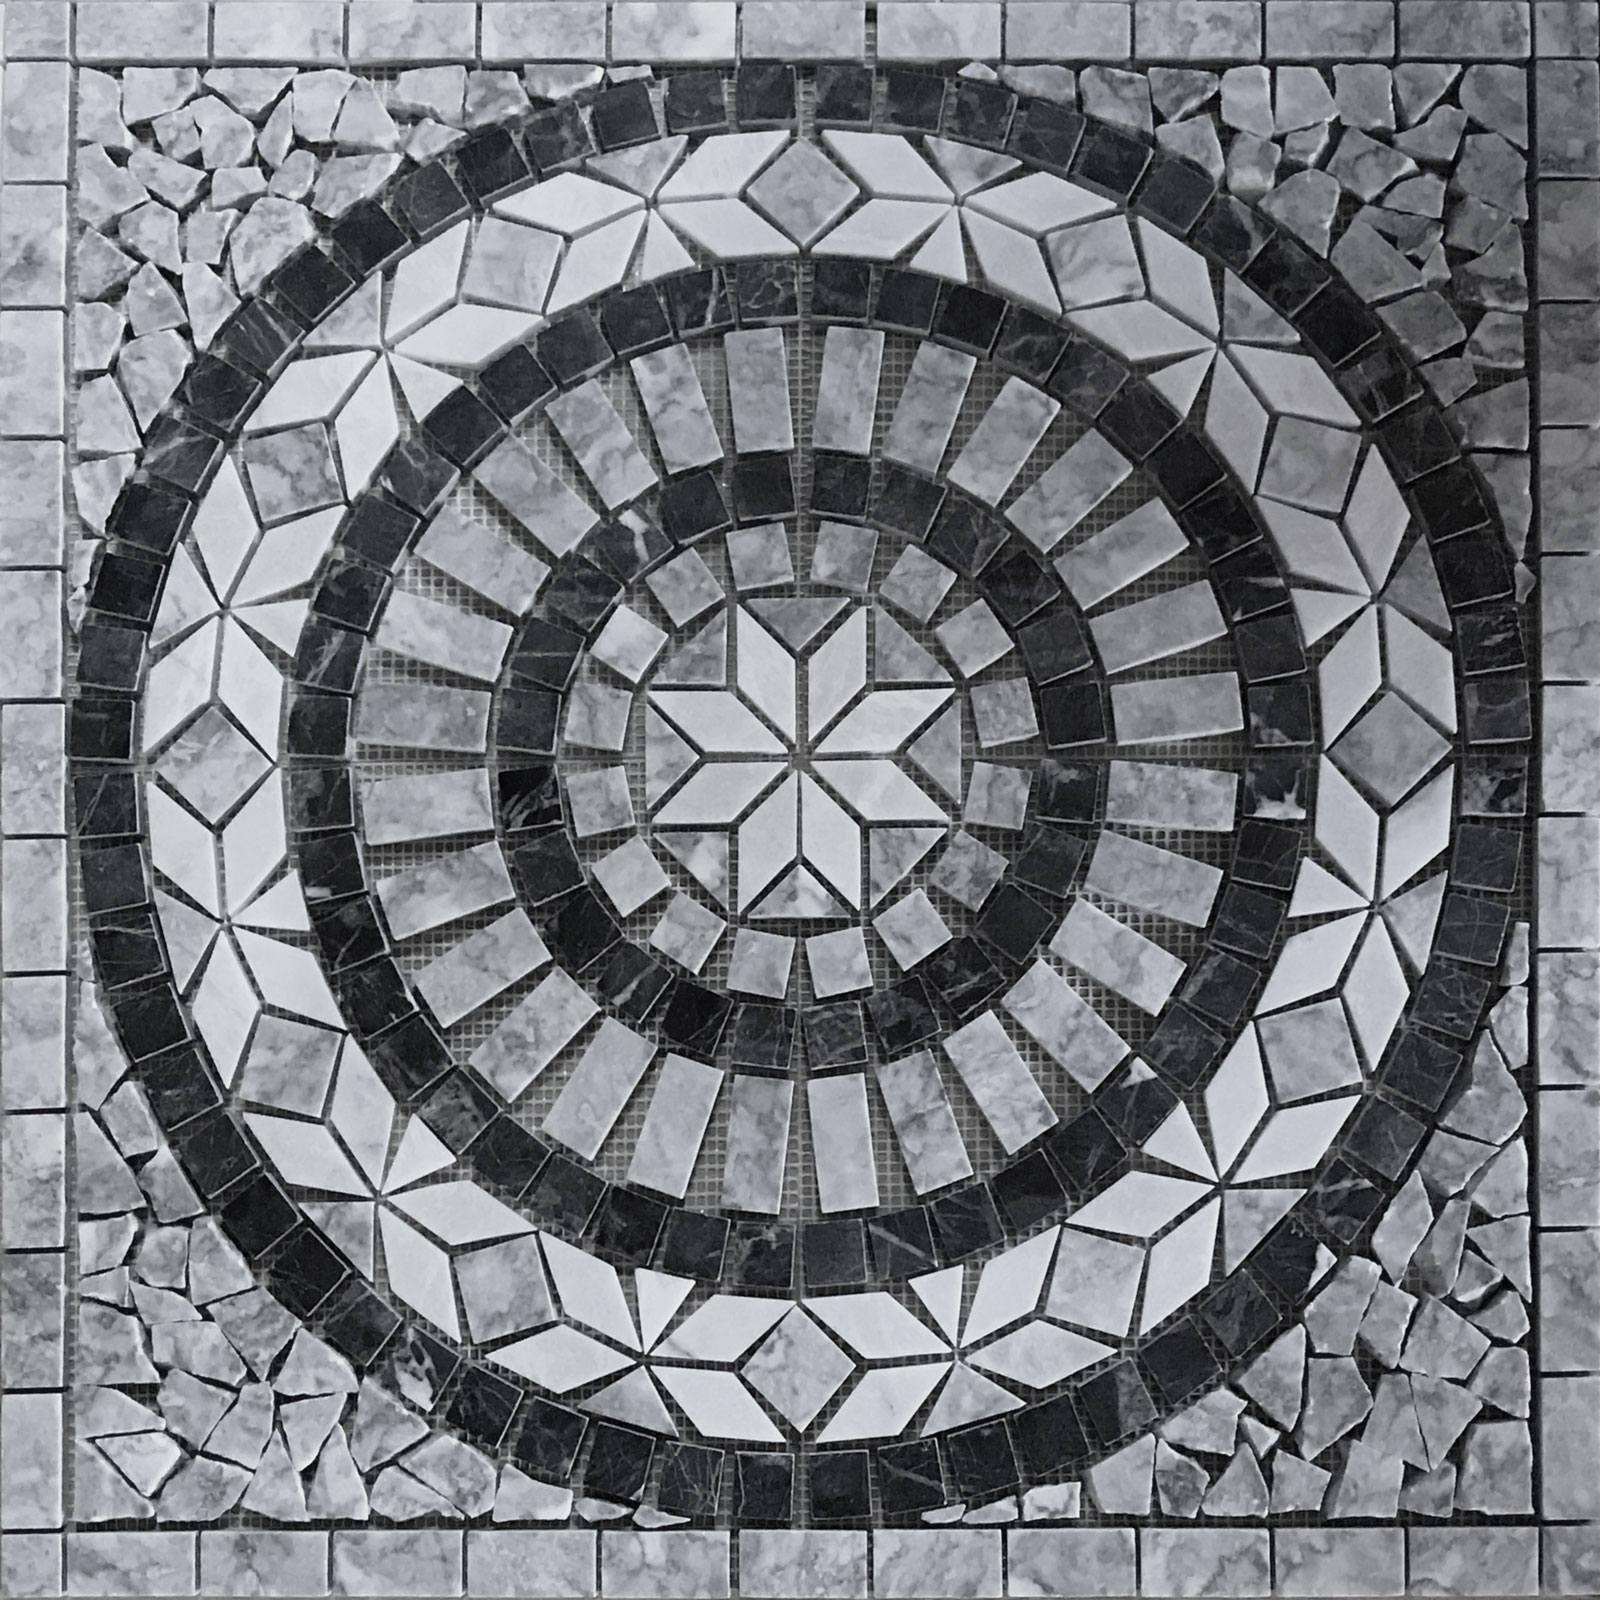 24x24 Home Addition: White And Gray 24x24 Medallion Backsplash Tile Mosaic